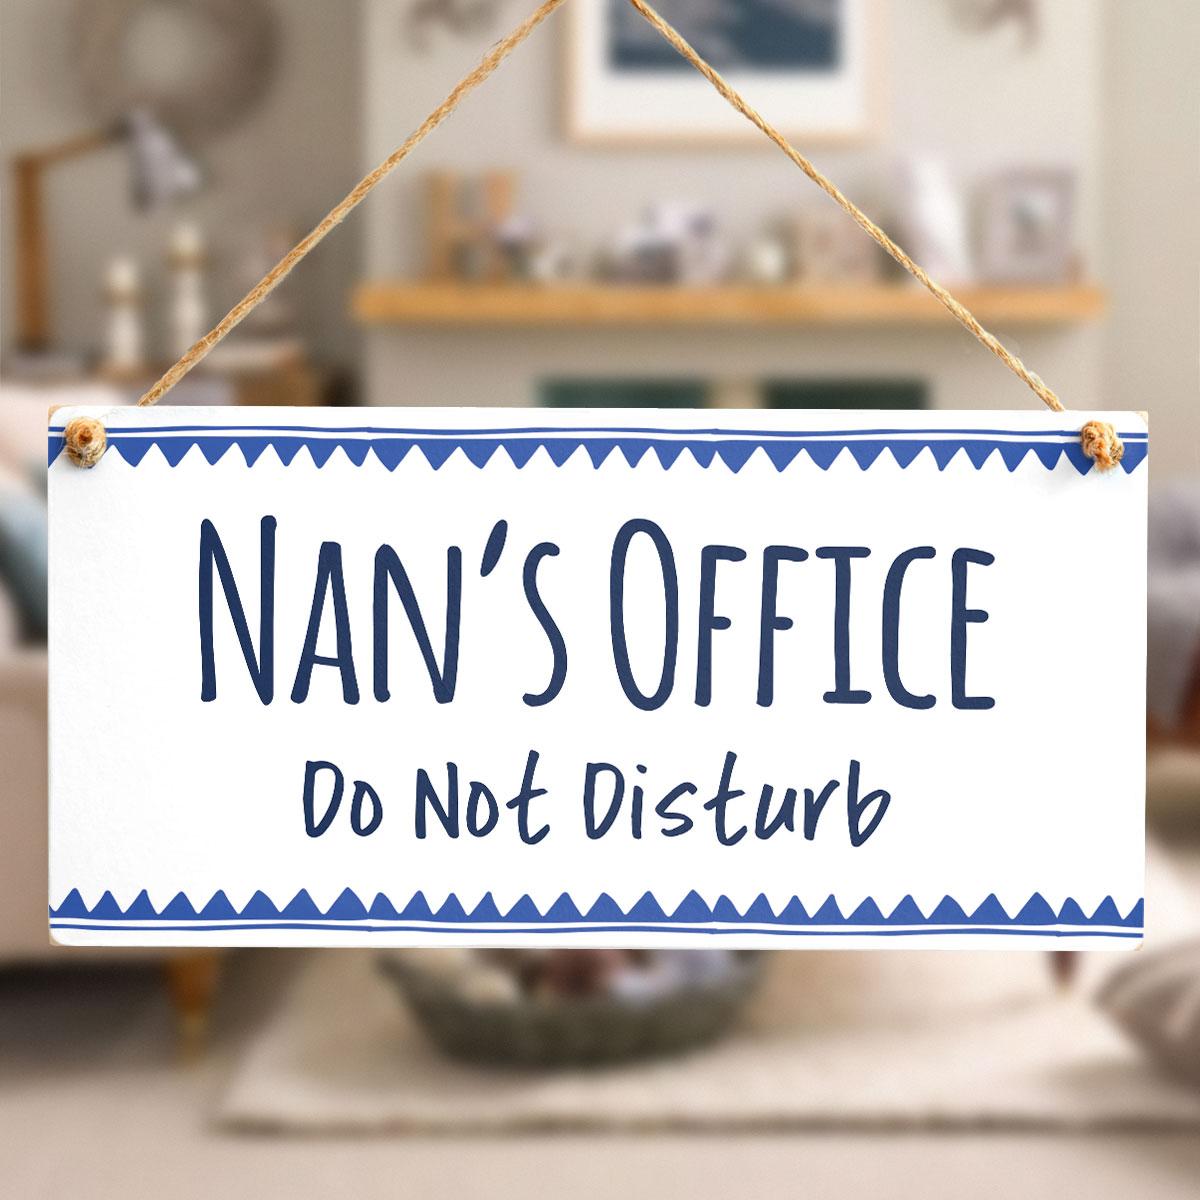 Nan\u0027s Office Do Not Disturb \u2013 Stylish Office Door Plaque With Blue Border  sc 1 st  ButtonHillCottage & Nan\u0027s Office Do Not Disturb - Stylish Office Door Plaque With Blue ...